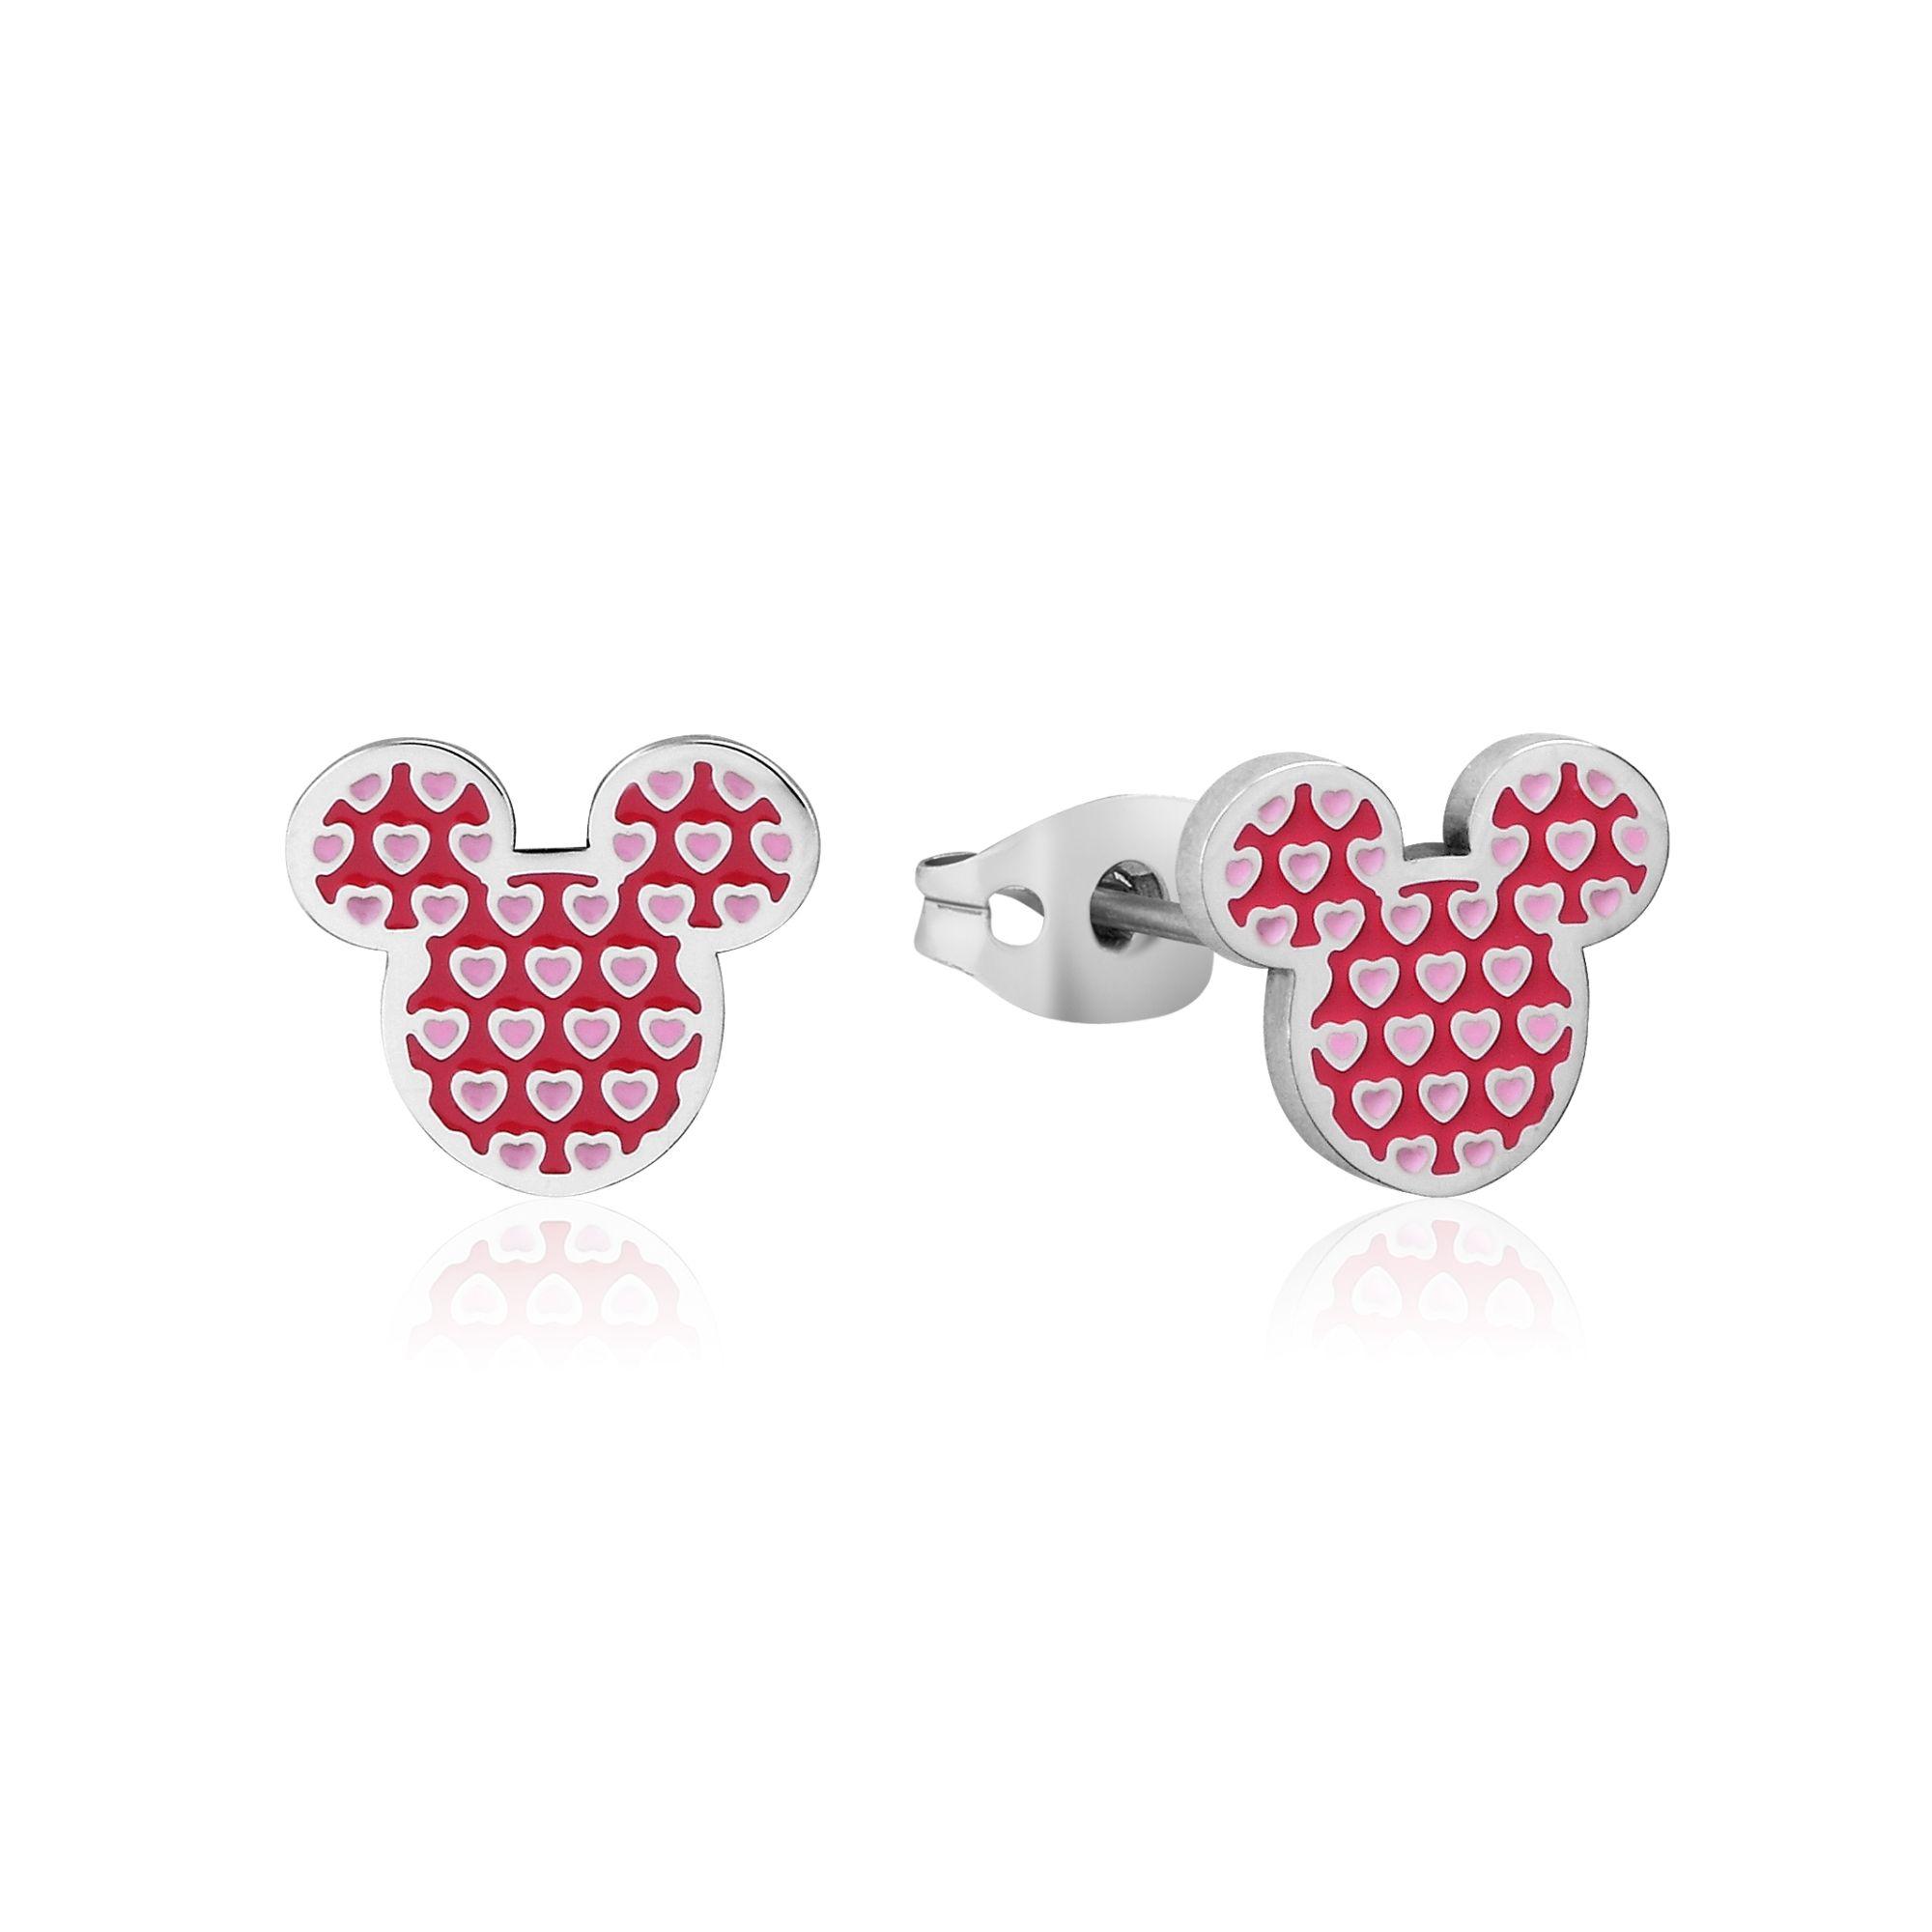 DISNEY Stainless Steel 11mm Minnie Mouse Pink Heart Stud Earrings